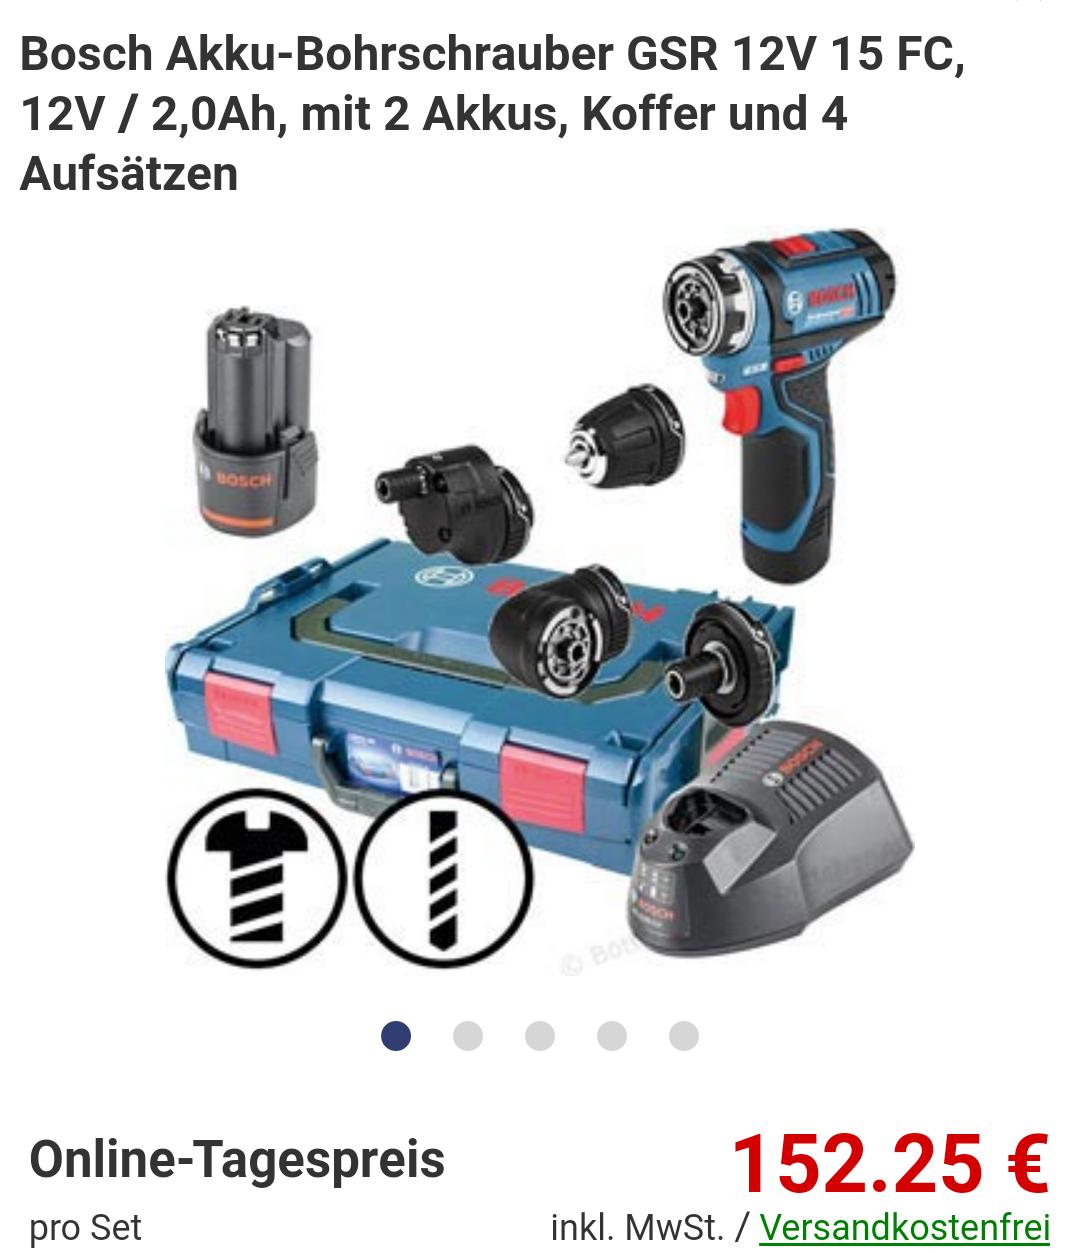 Bosch Akku-Bohrschrauber GSR 12V 15 FC, 12V / 2,0Ah, mit 2 Akkus, Koffer und 4 Aufsätzen